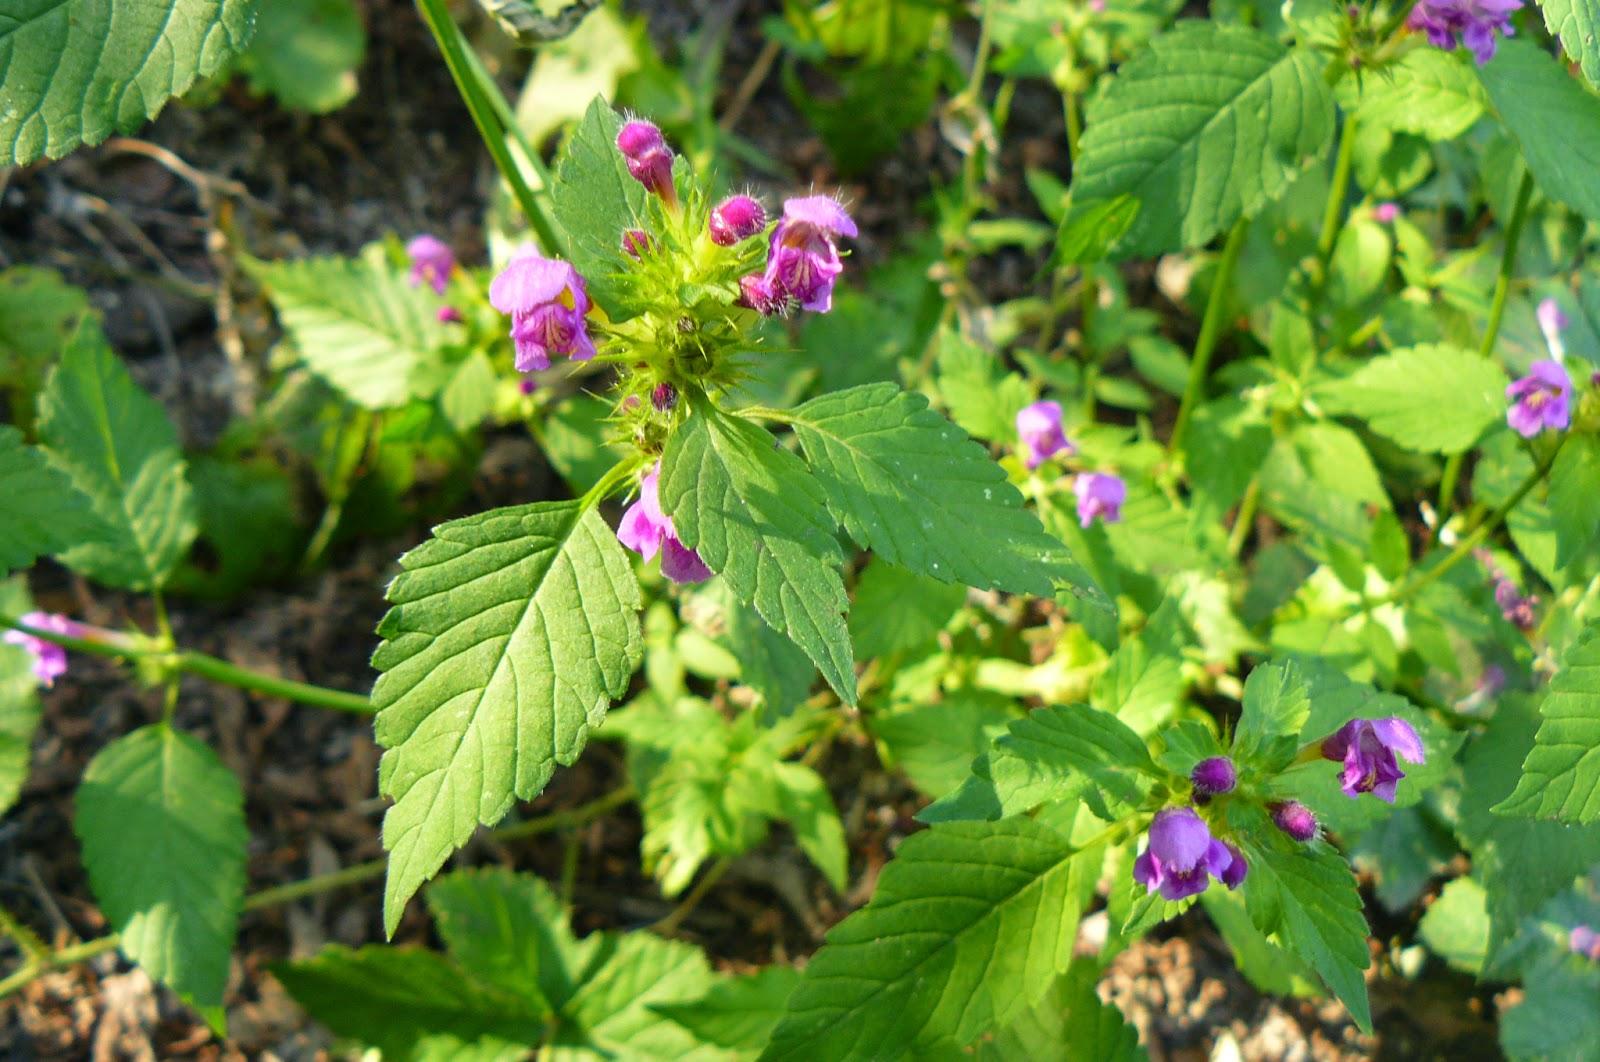 jasnota purpurowa Lamium purpureum L.